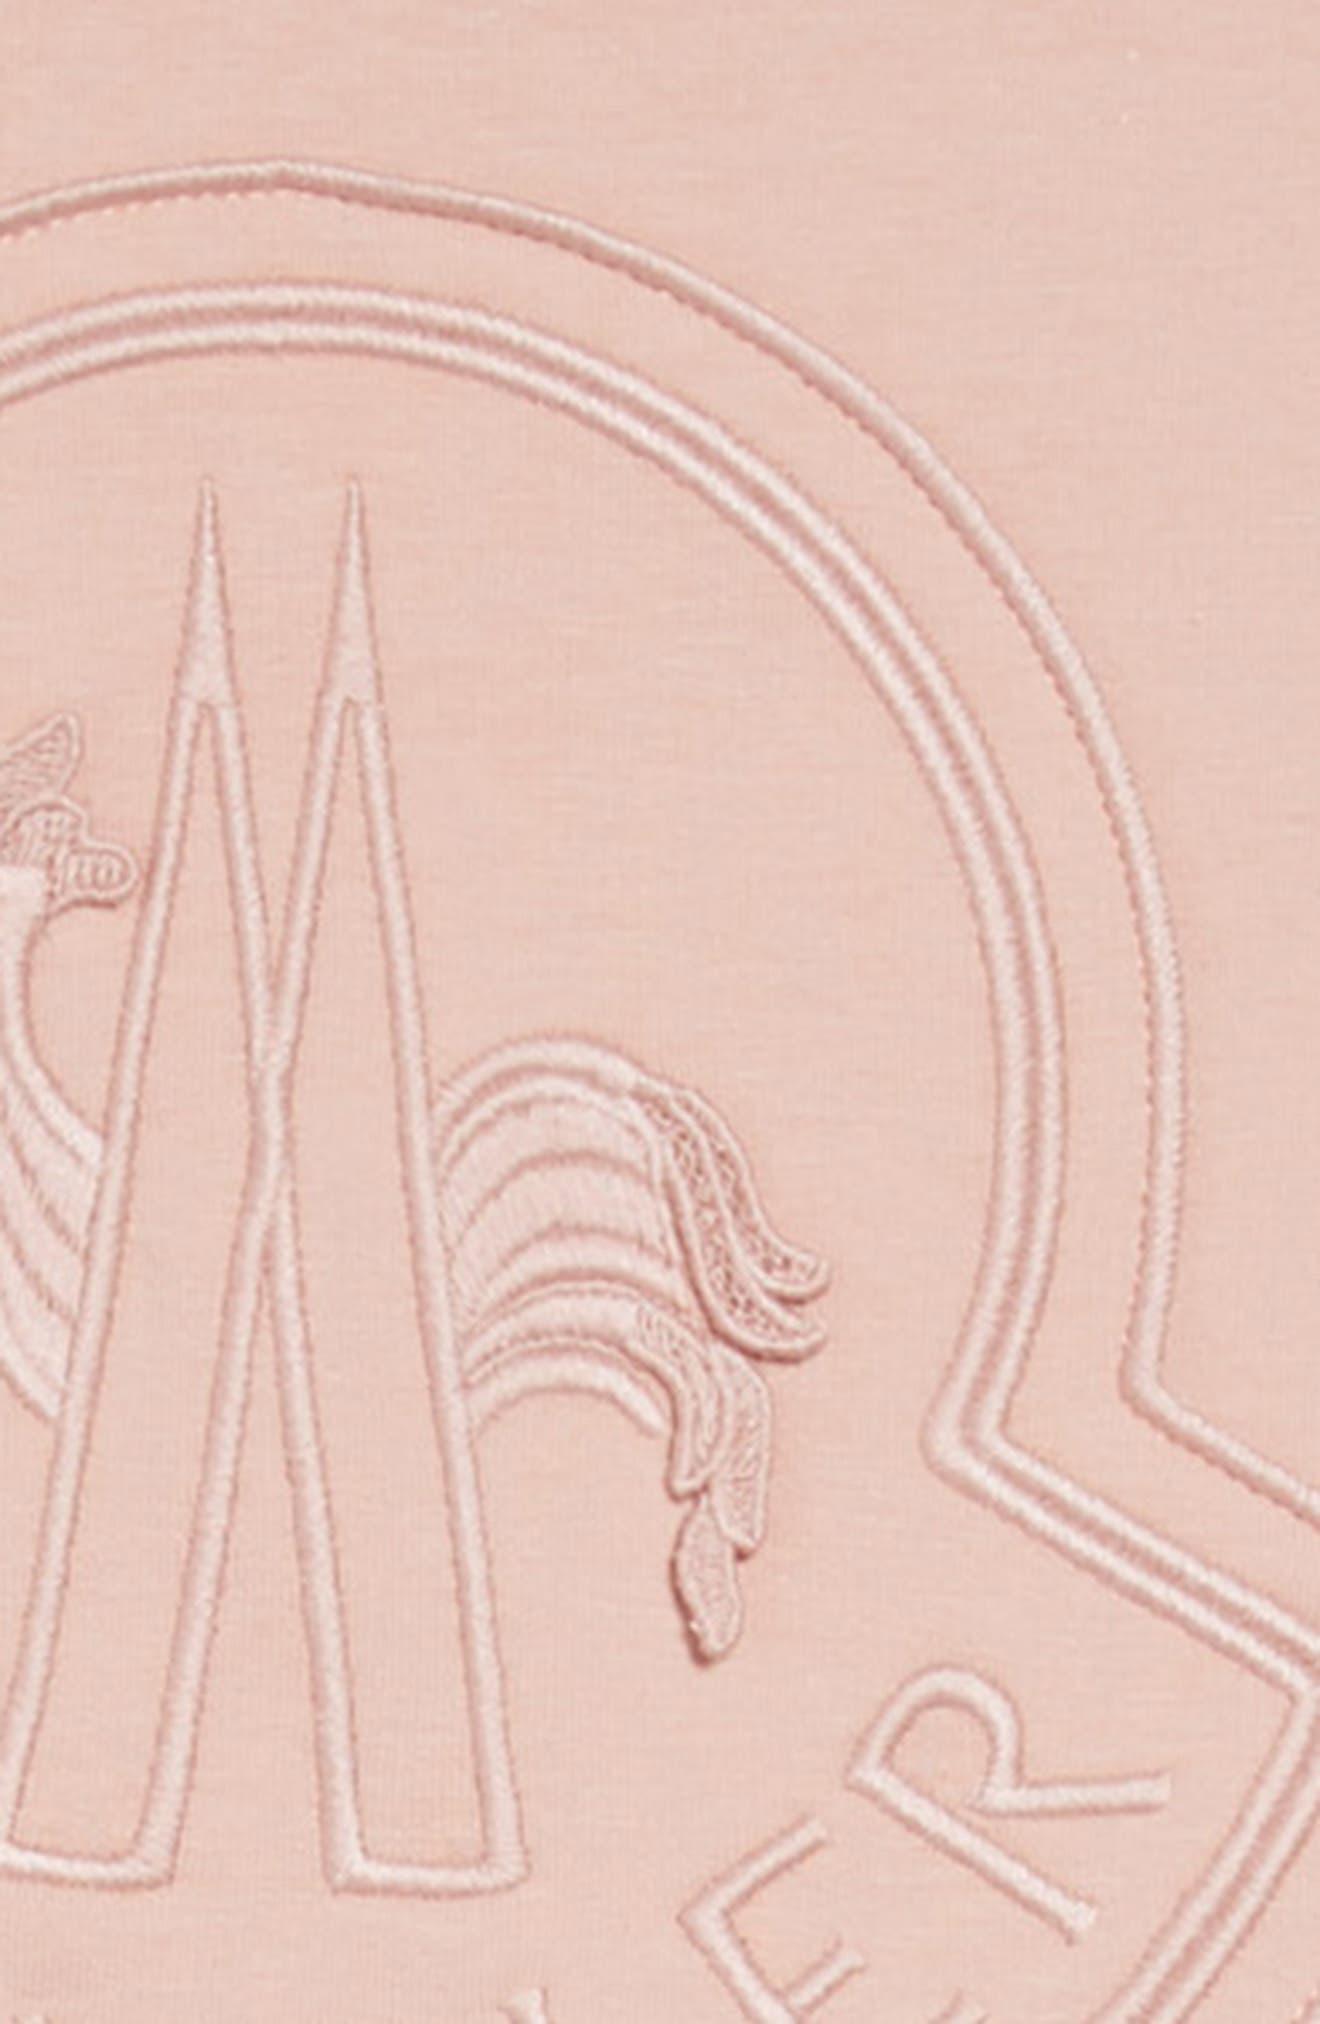 MONCLER,                             Tonal Logo Dress,                             Alternate thumbnail 3, color,                             LIGHT PINK